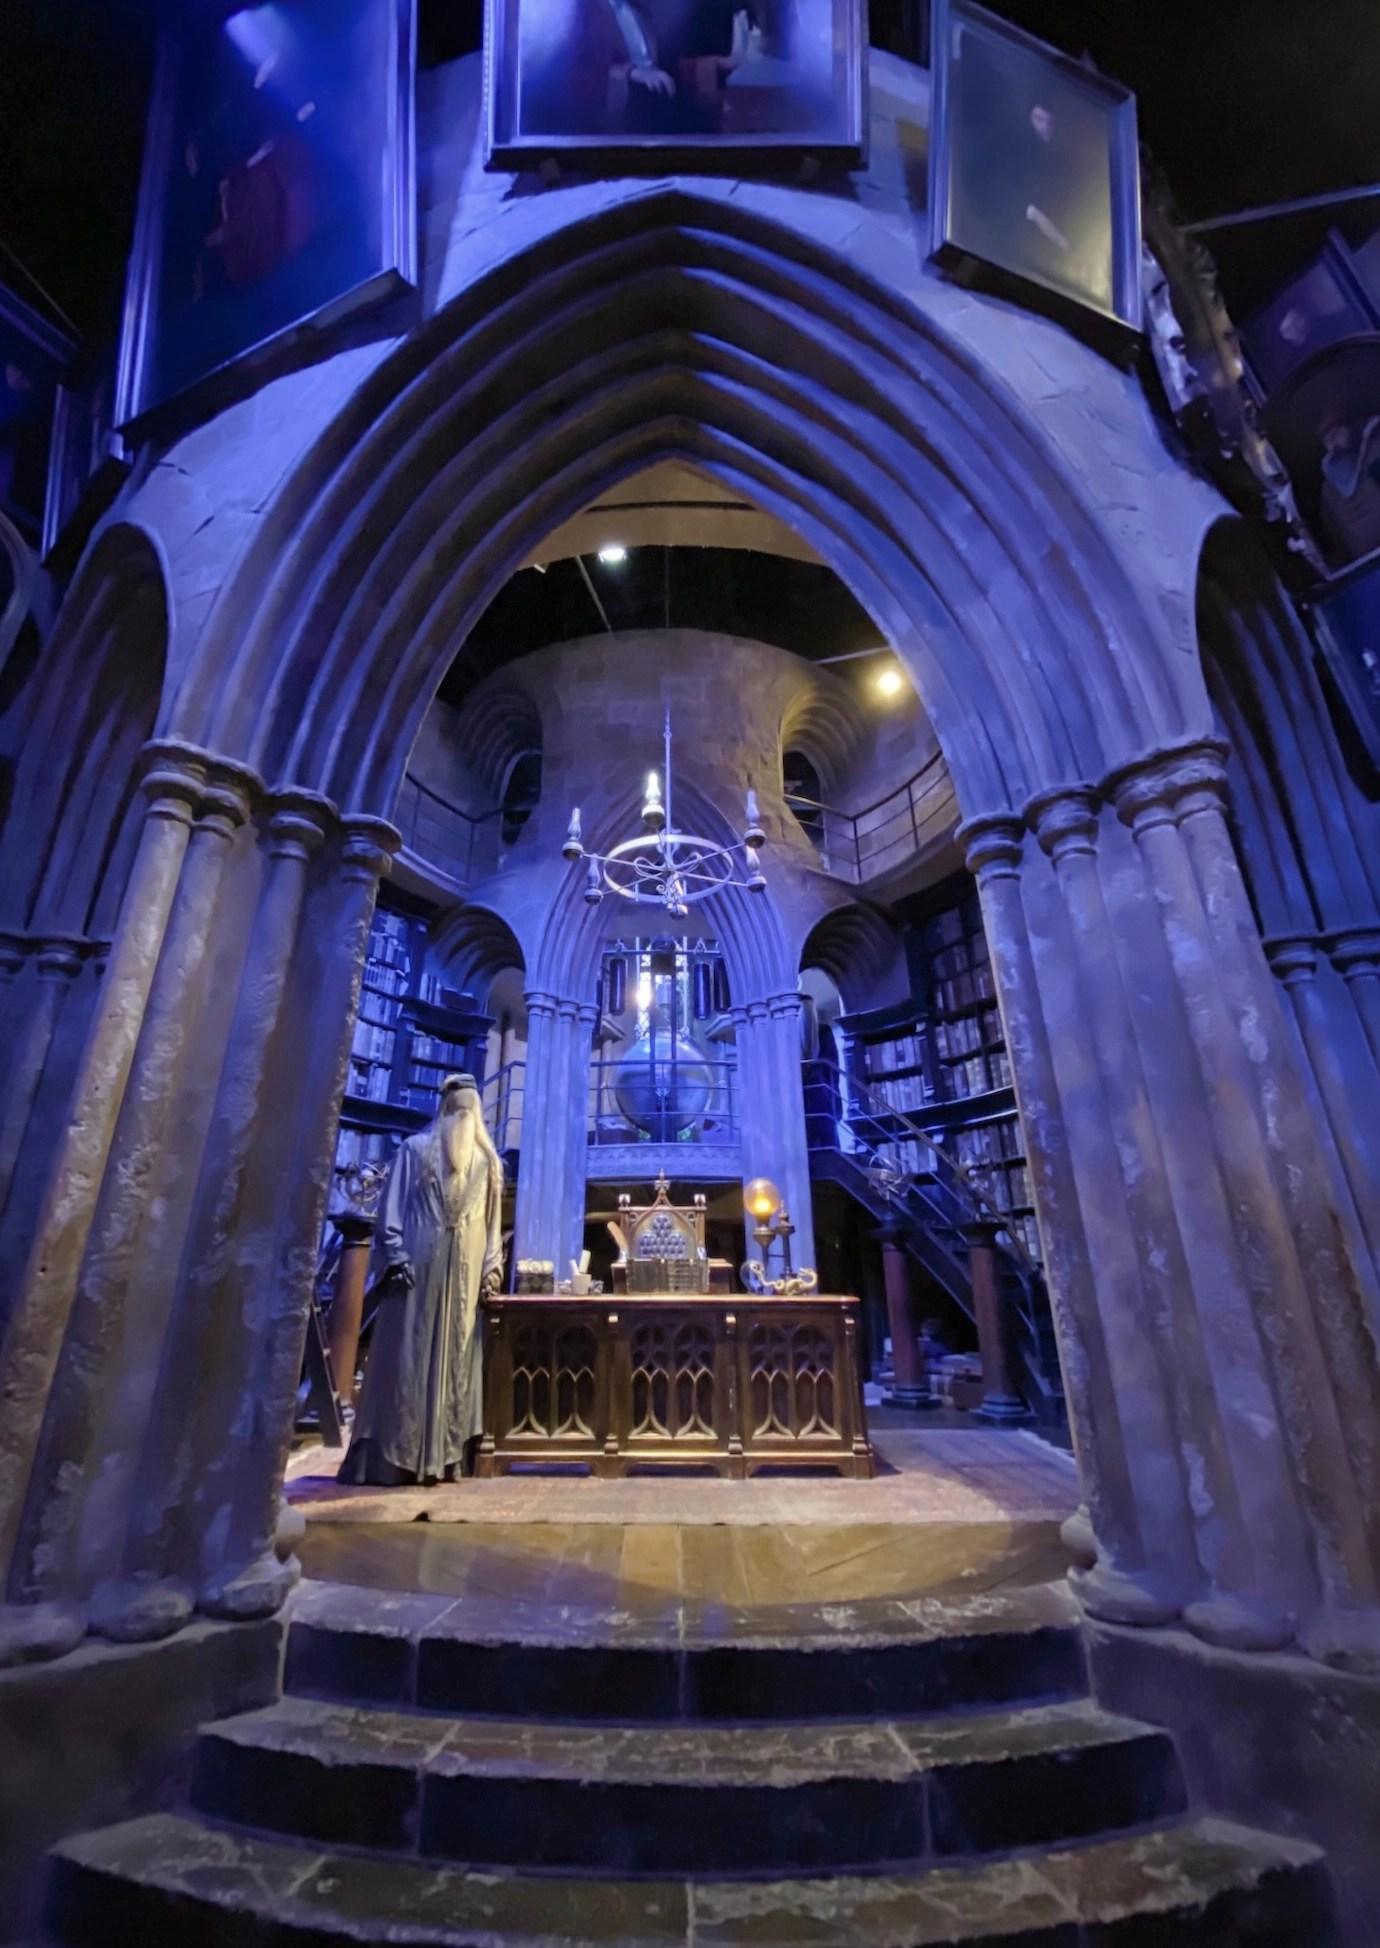 Harry Potter Studio Tour - Dumbledore's Office